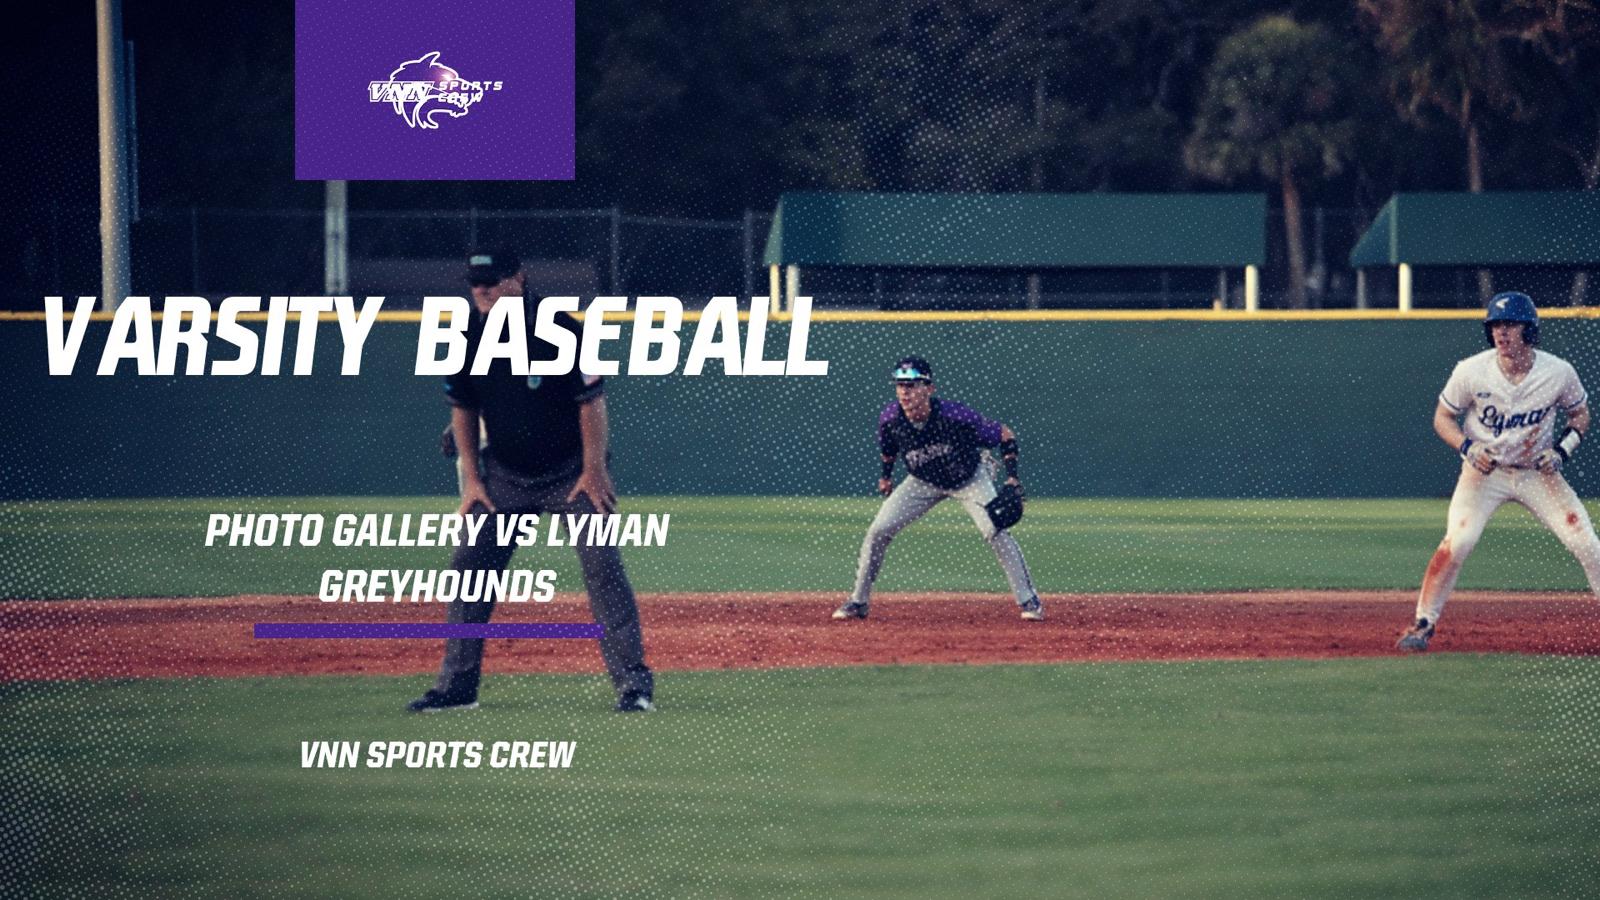 Varsity Baseball | Photo Gallery vs Lyman Greyhounds